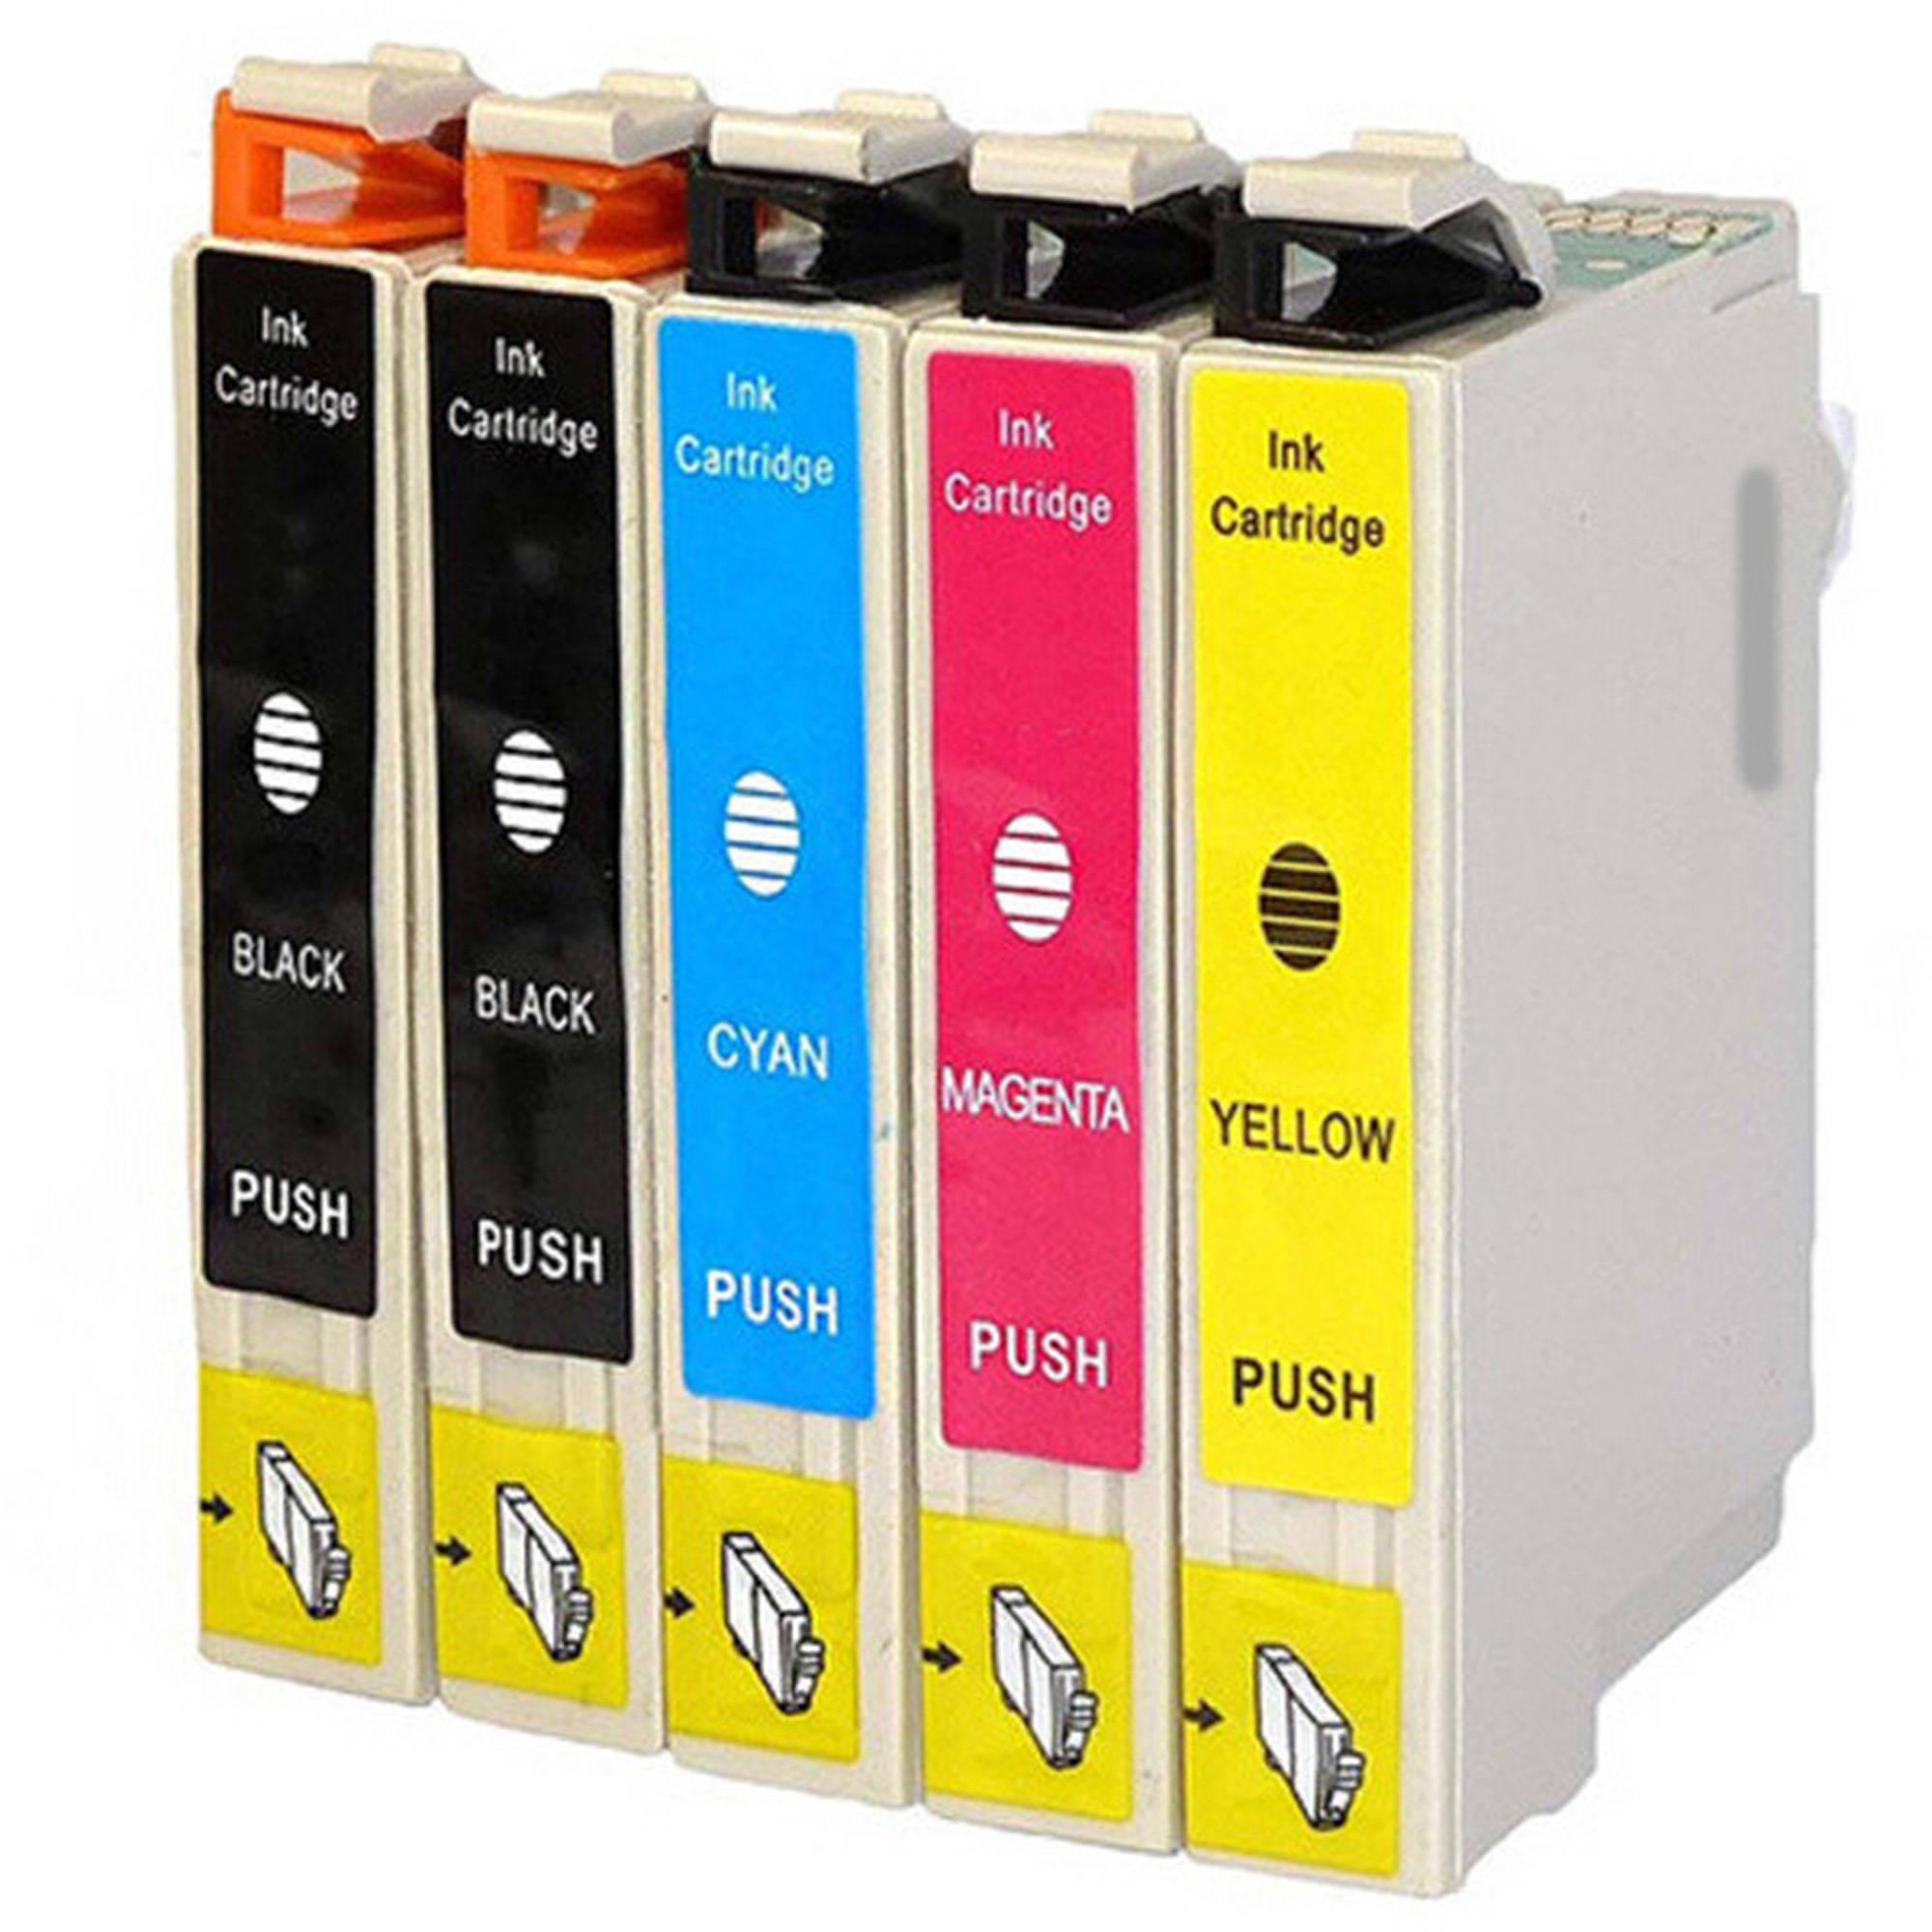 Compatible Inkjet Cartridges Multipack for Canon CLI-271 XL/PGI-270 XL, 5-Pack